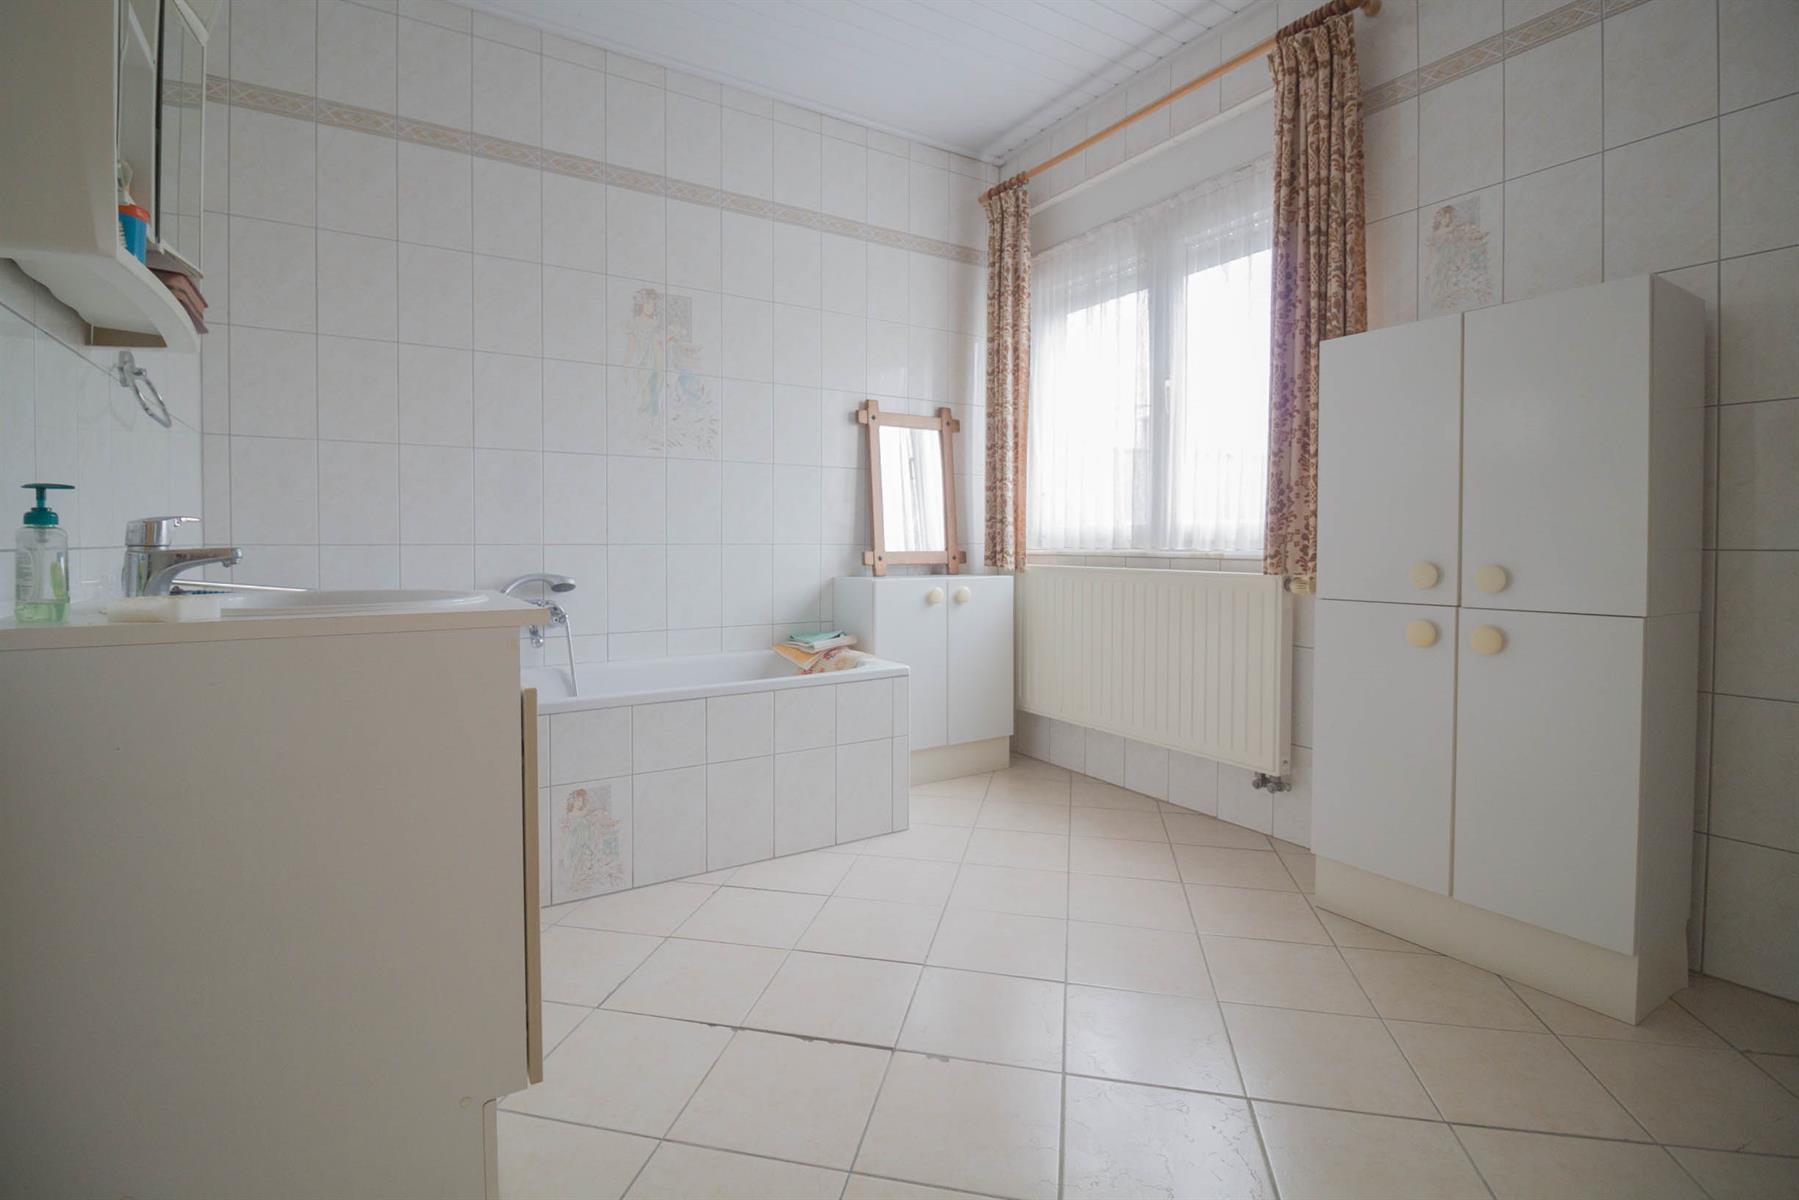 Appartement - Trazegnies - #4359277-16